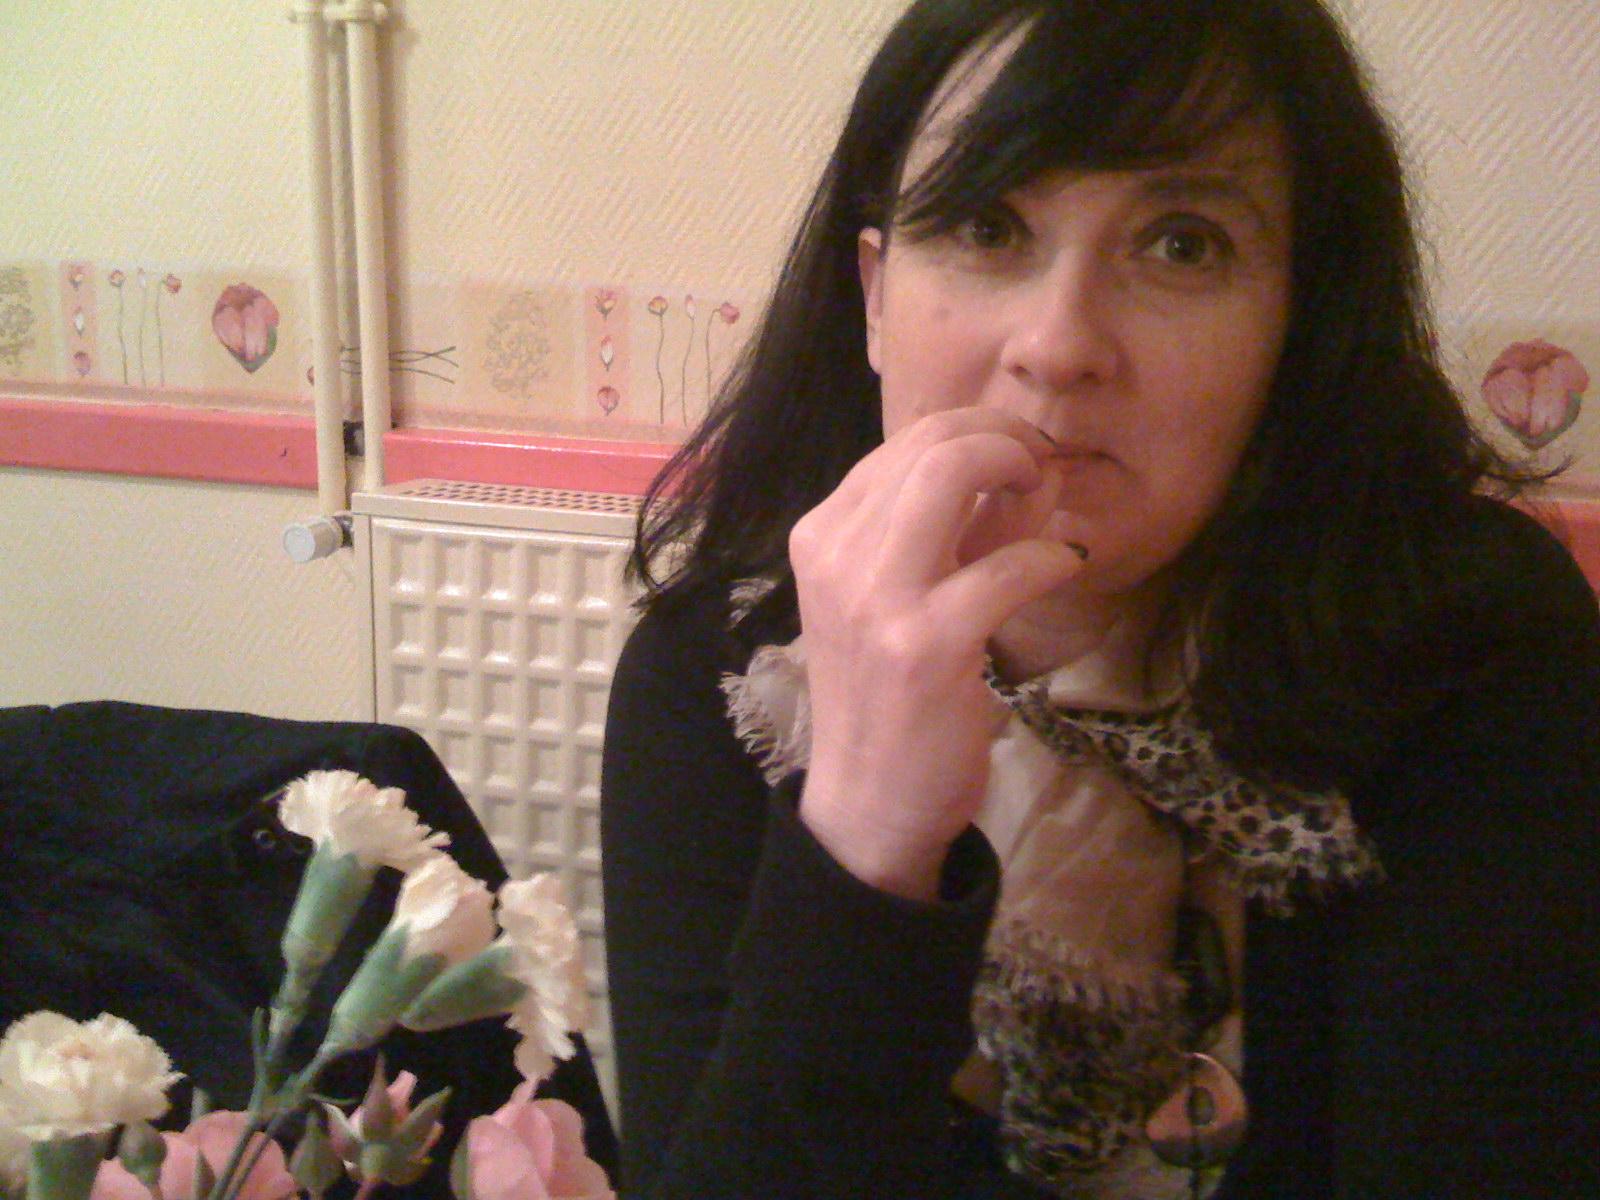 Bienvenue à Mademoiselle Diane, future mariée d'avril 2012